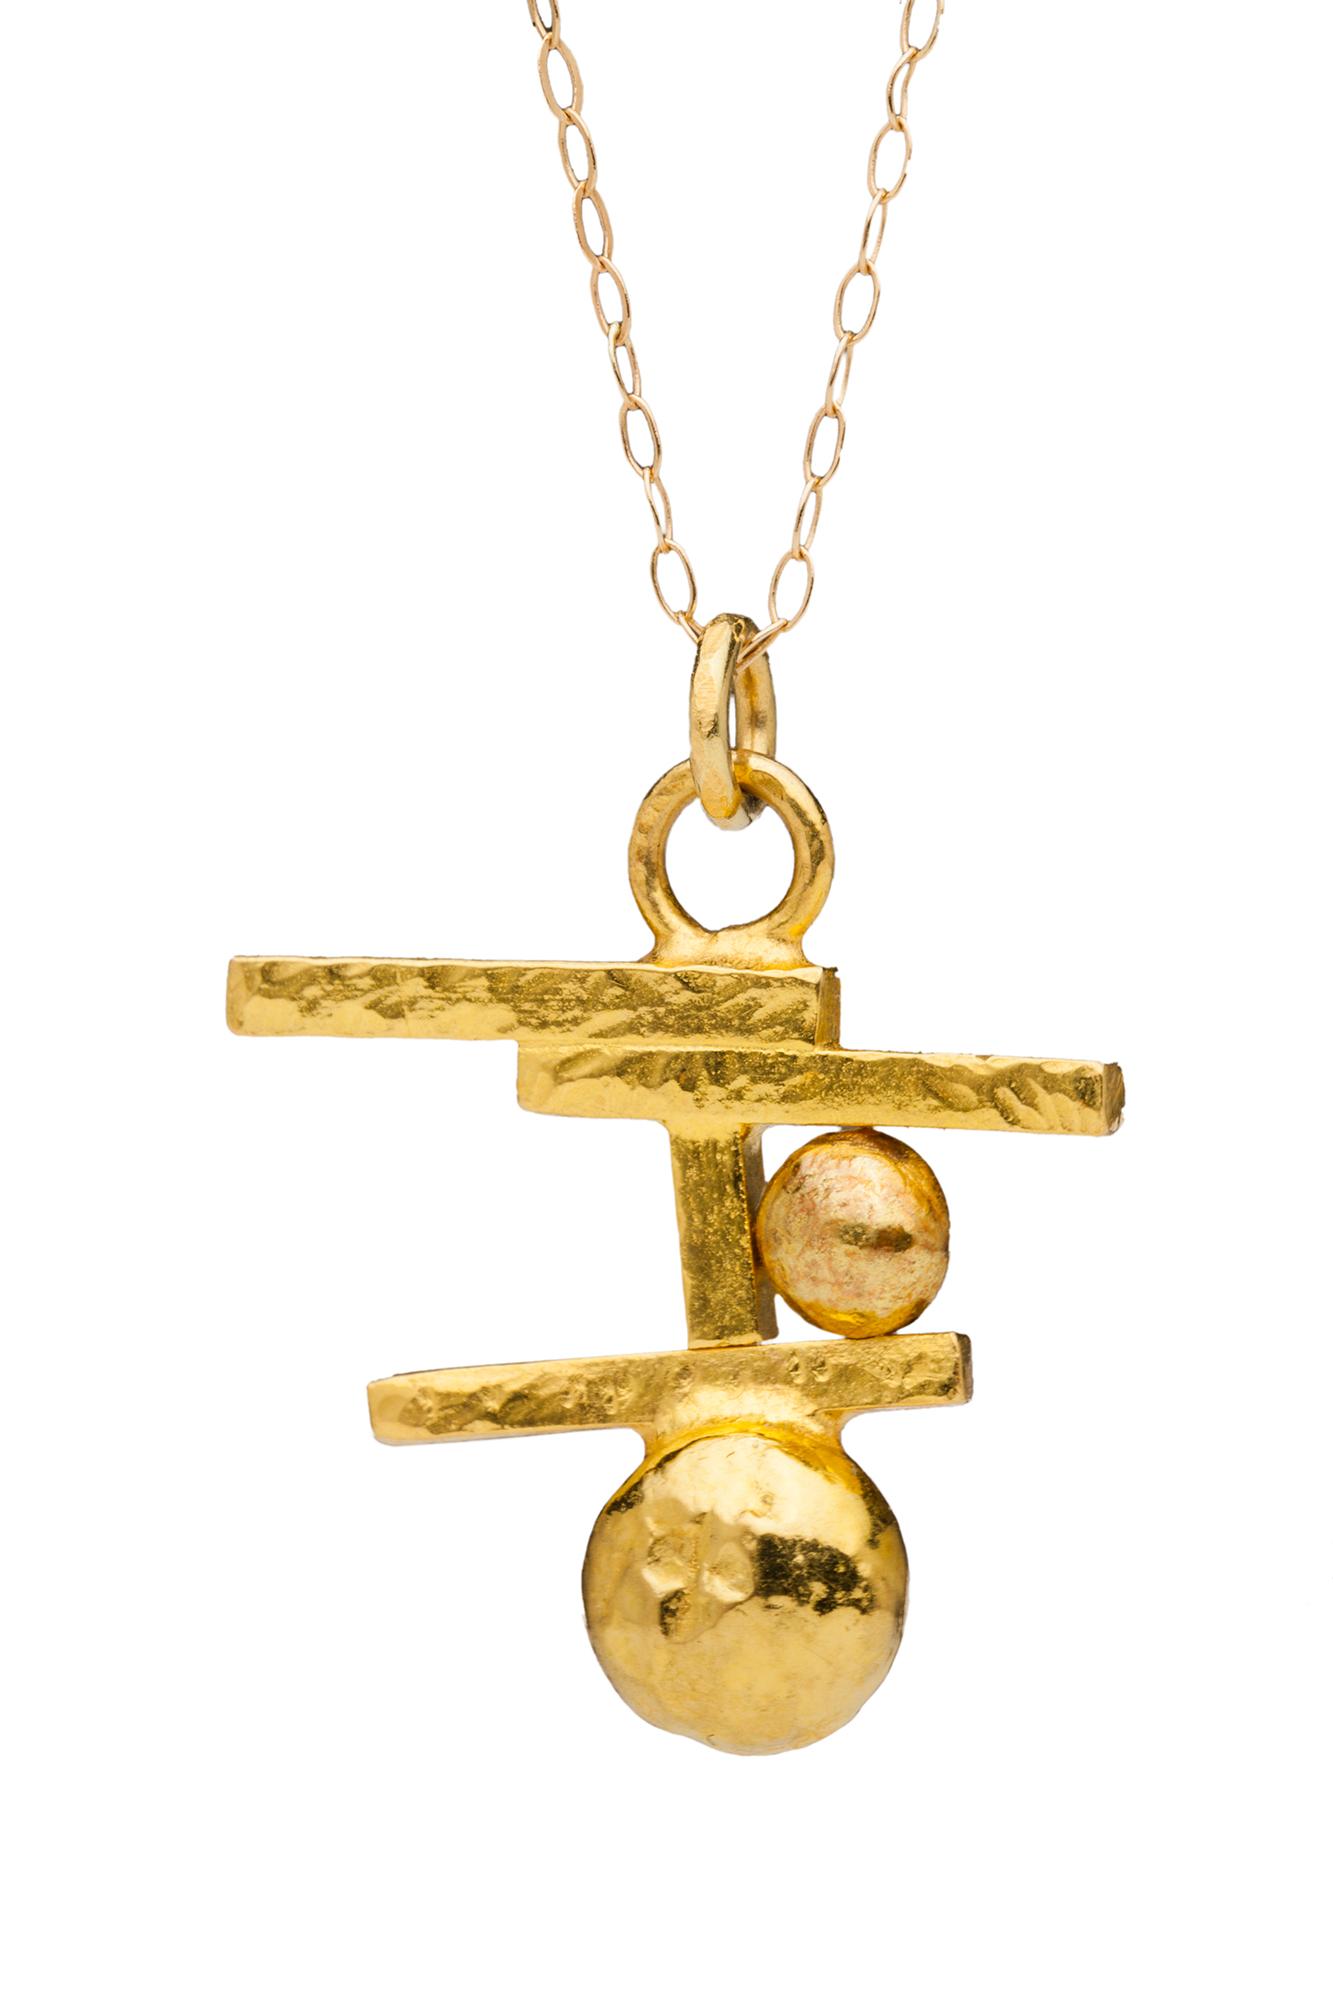 22k gold cairn pendant. 2018.